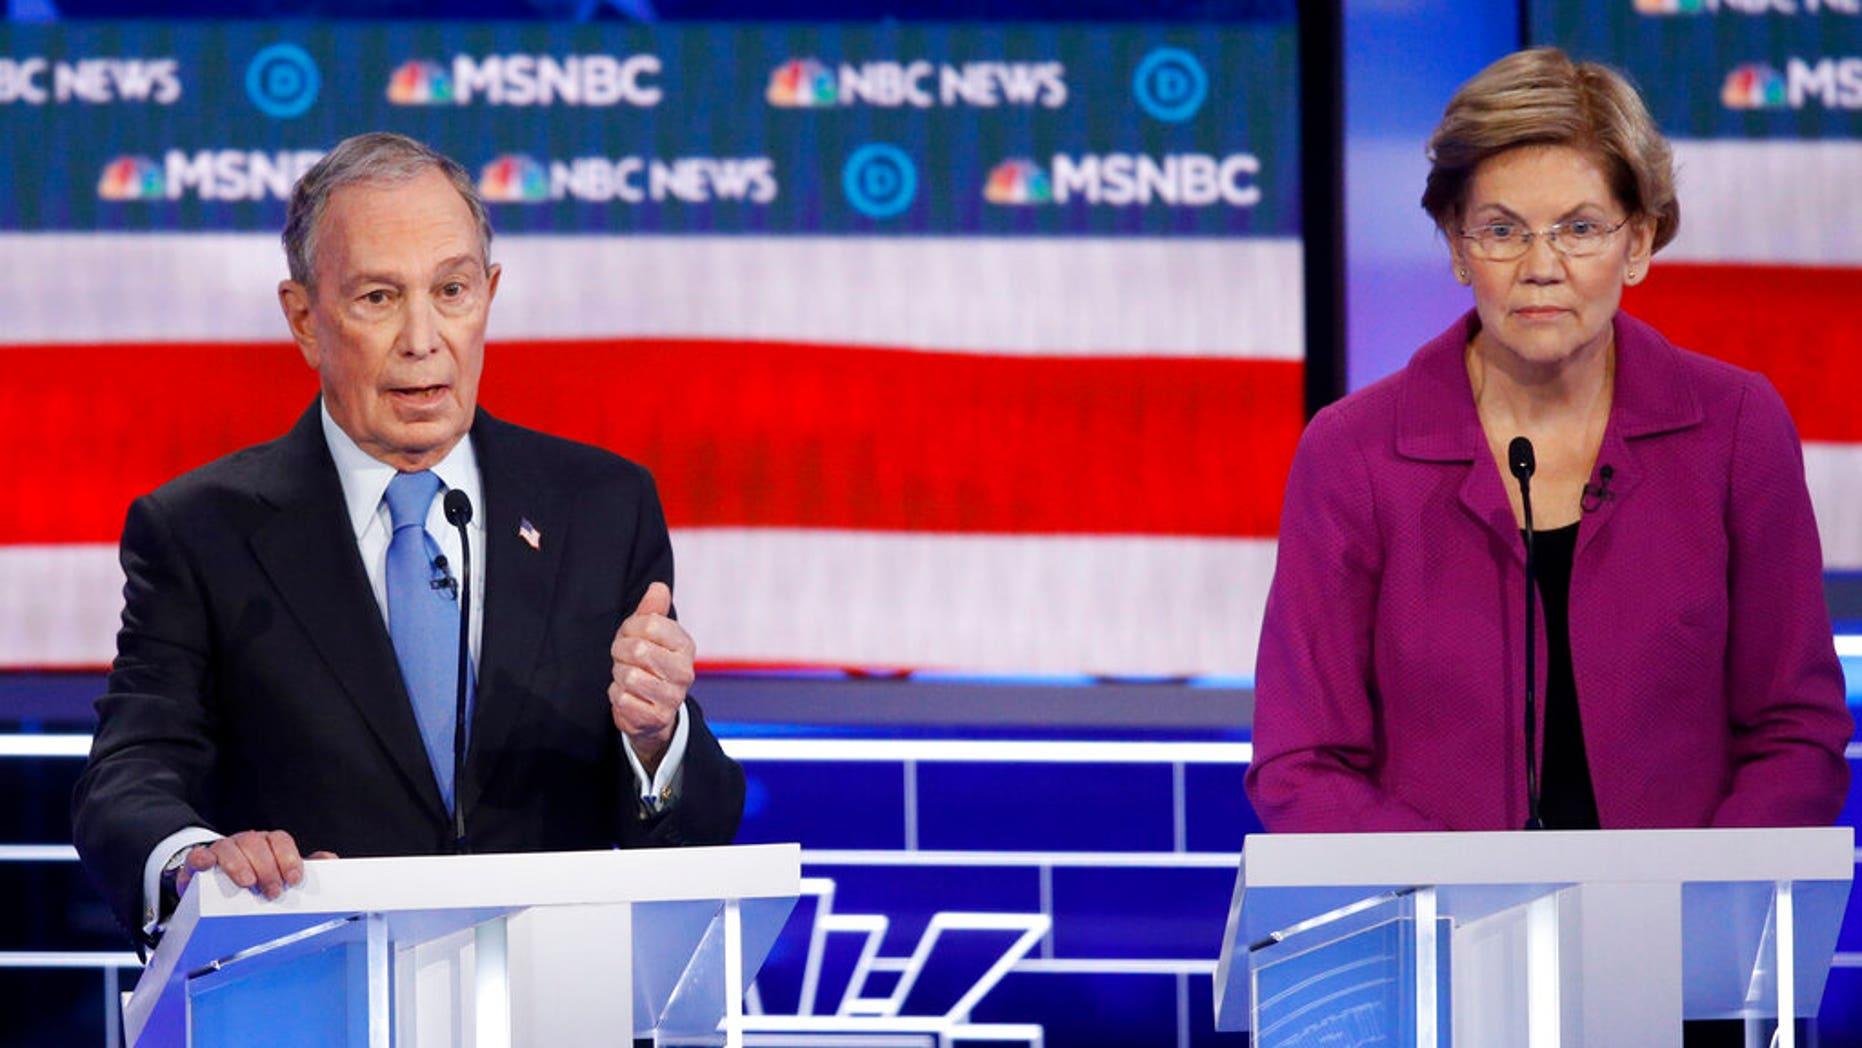 Democratic presidential candidates, former New York City Mayor Mike Bloomberg and Sen. Elizabeth Warren, D-Mass., at the Democratic presidential primary debate in Las Vegas. (AP Photo/John Locher)